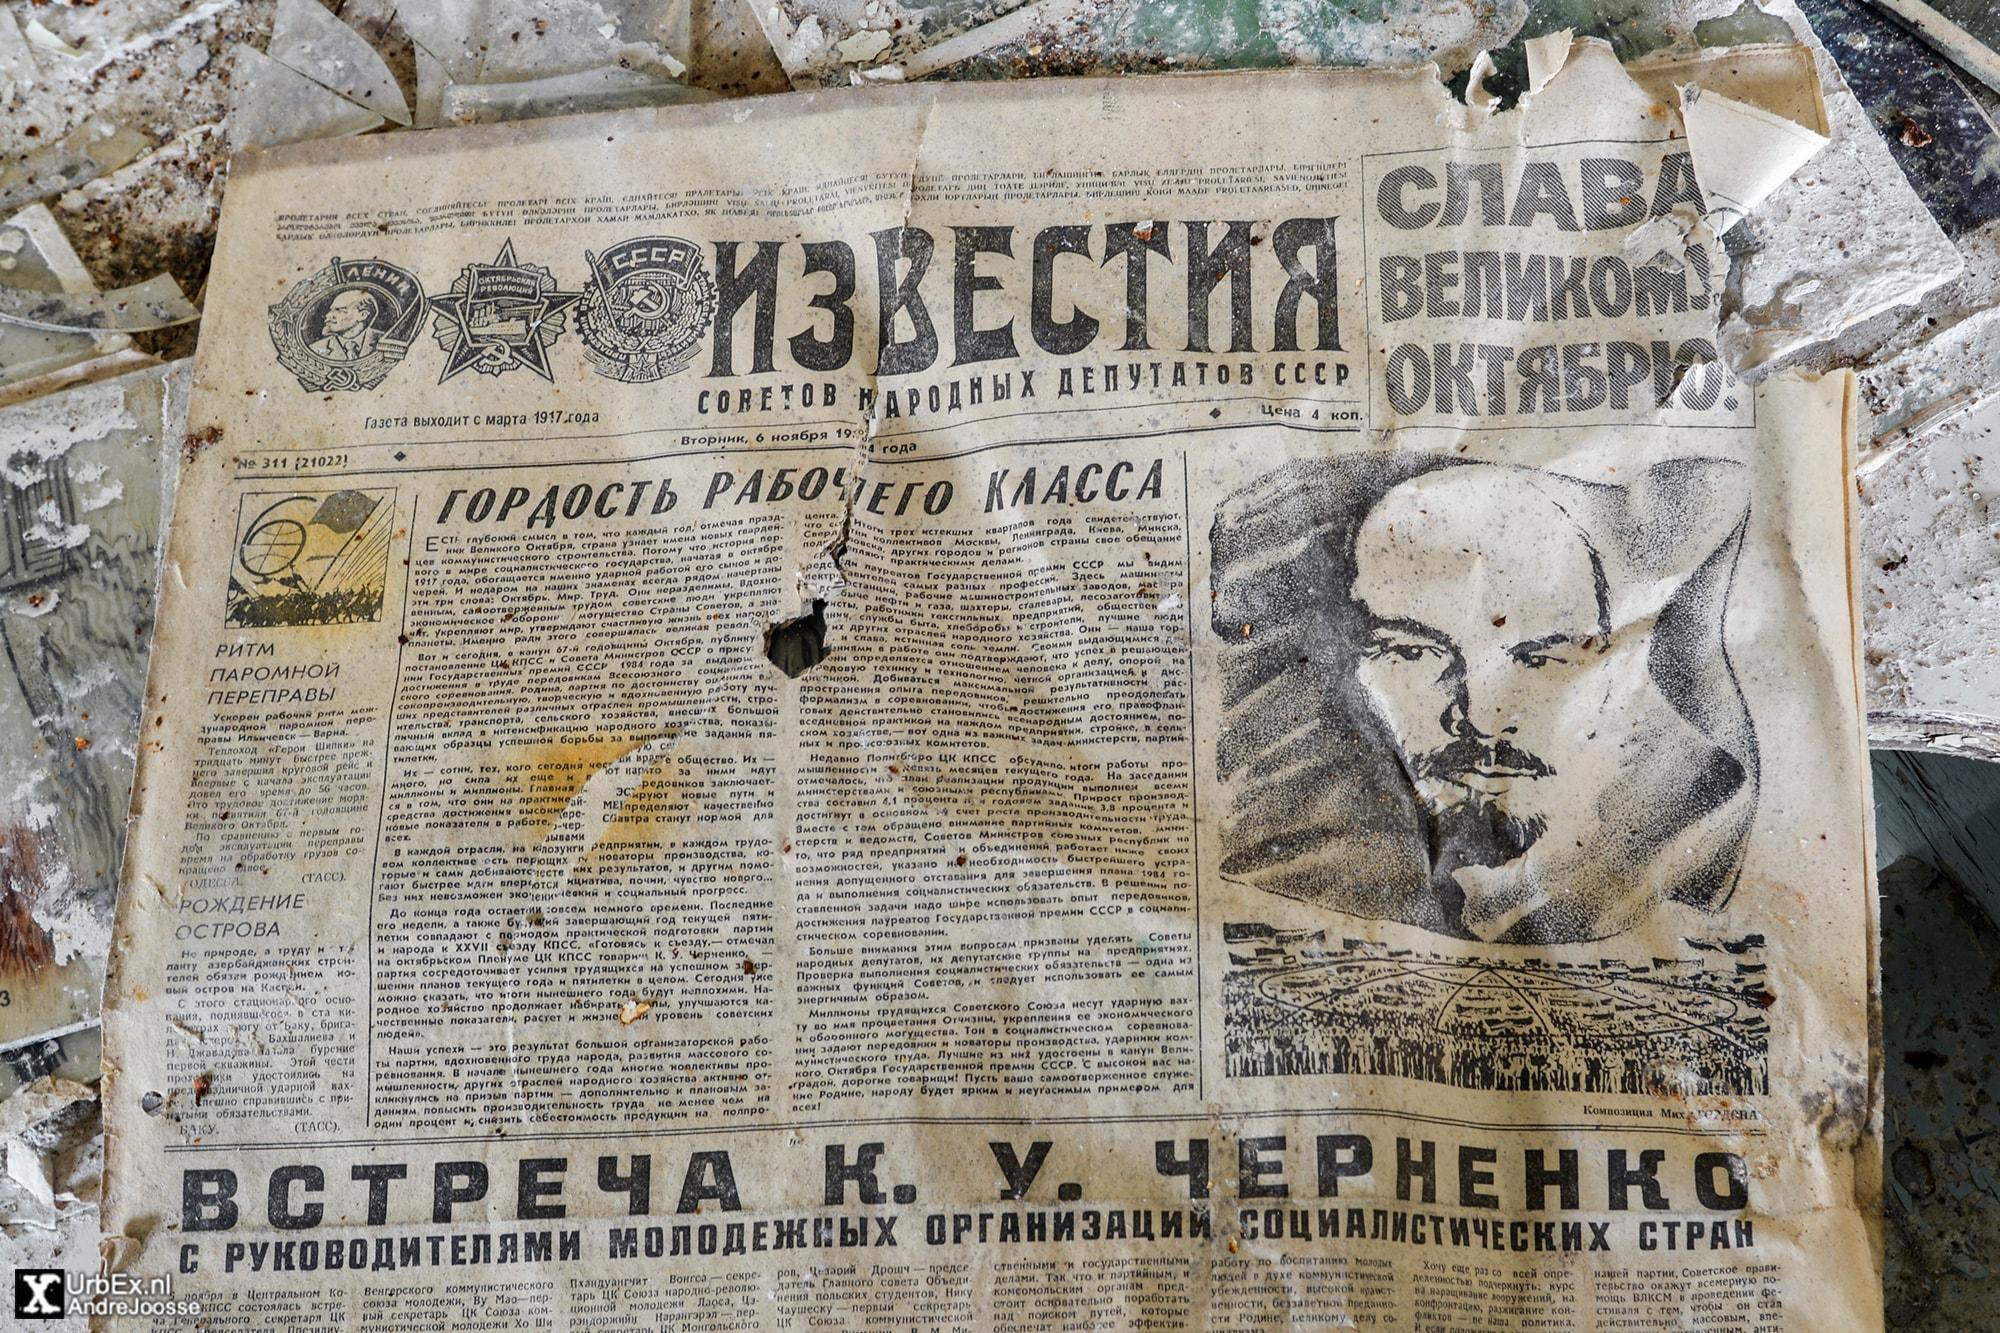 A Soviet newspaper